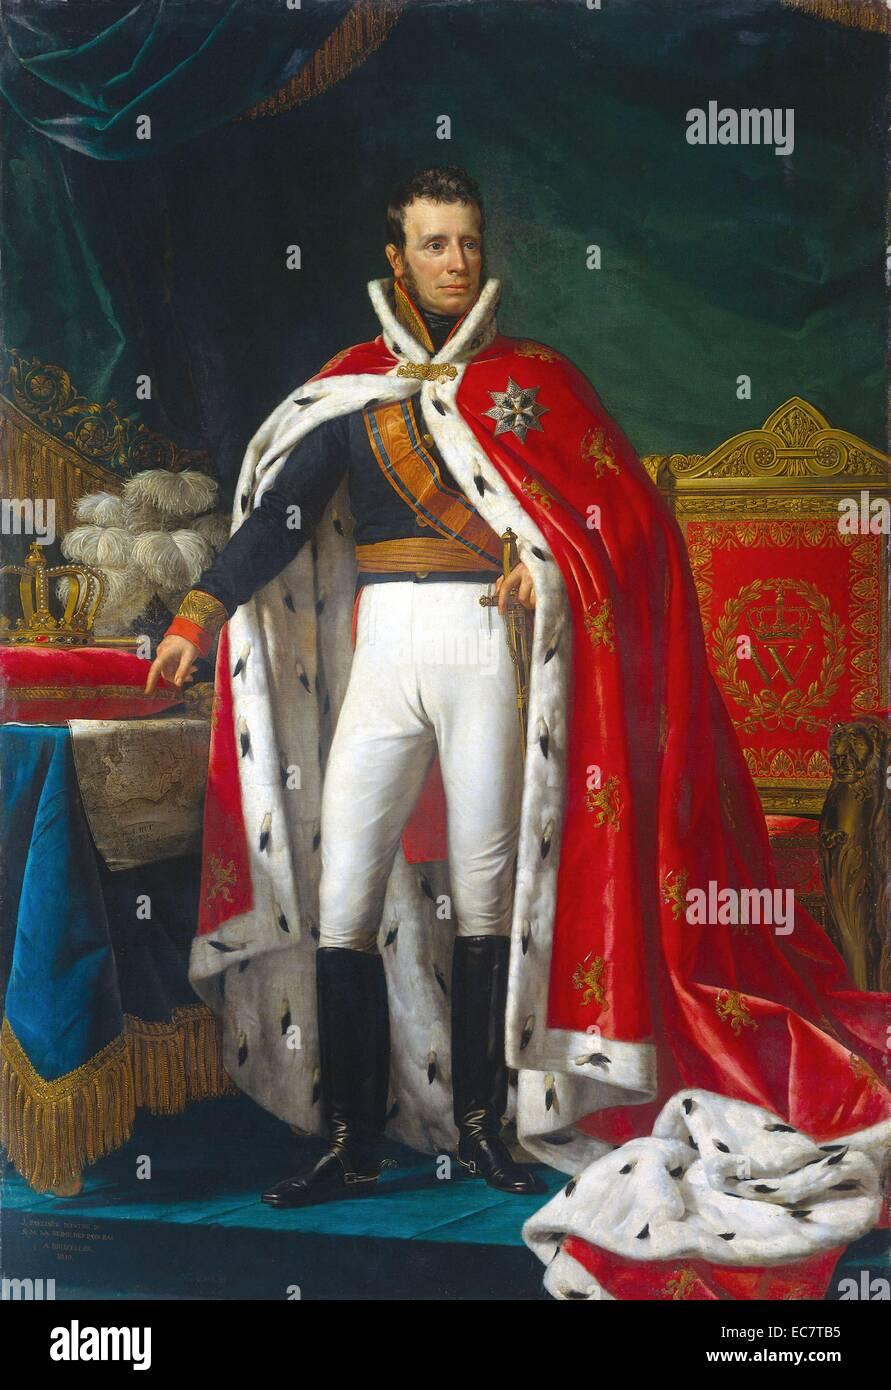 Willem I (1772-1843), Rey de los Países Bajos por Joseph Paelinck; 1819. Imagen De Stock